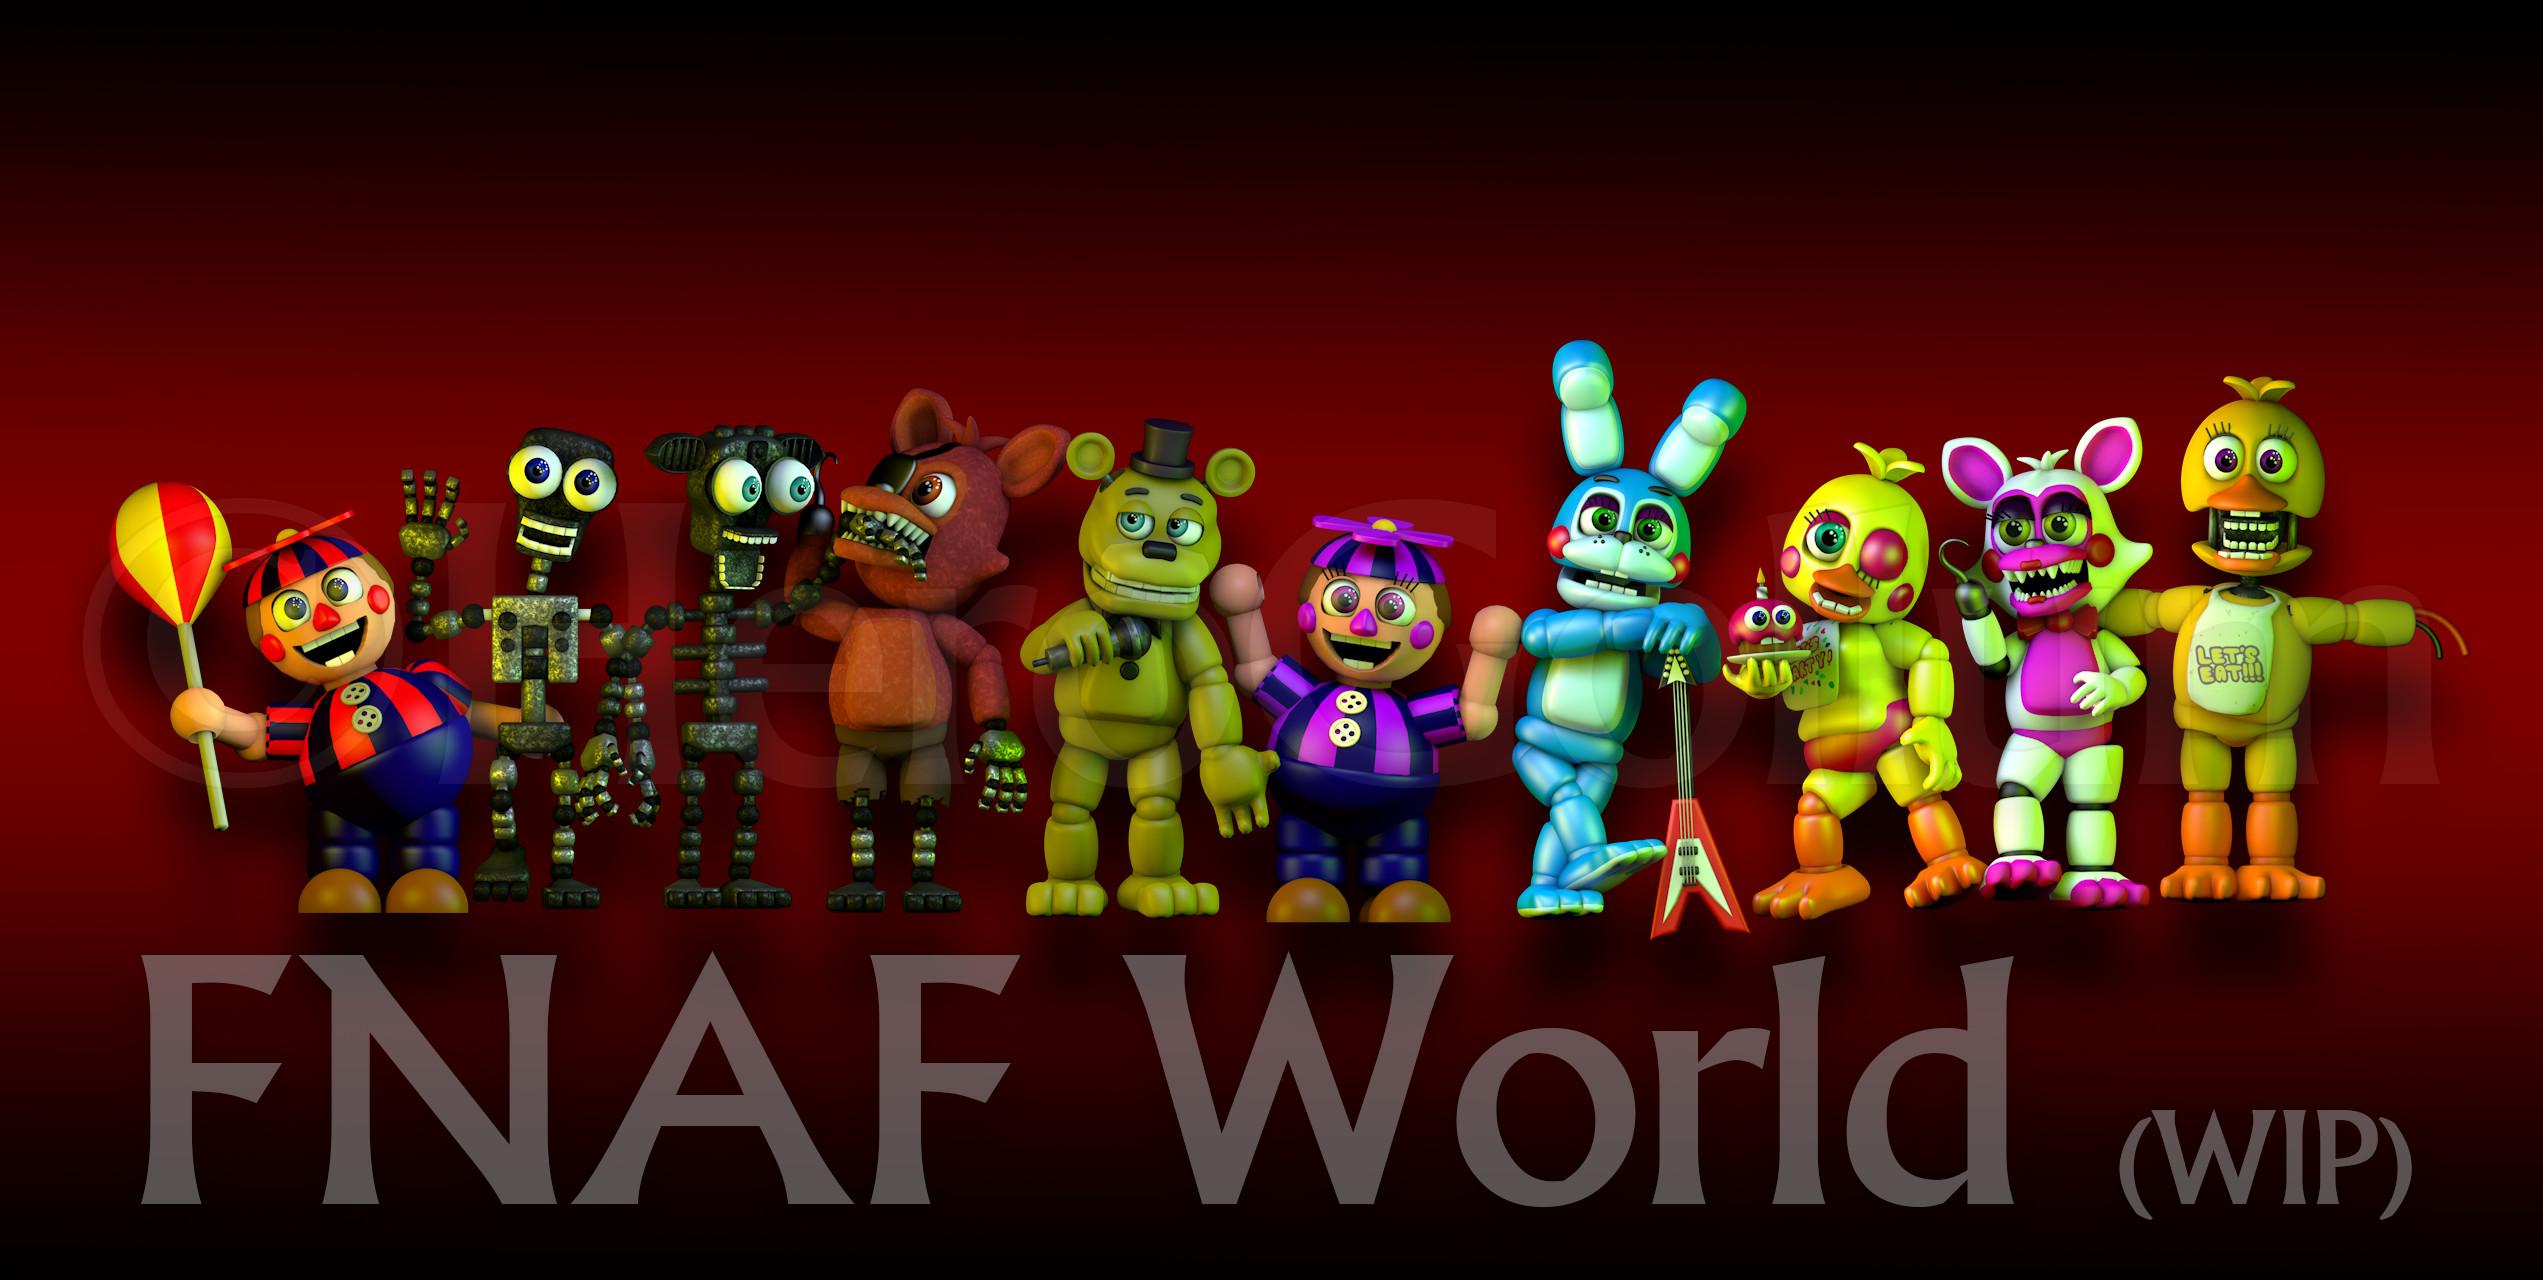 FNAF World Art! by HeroGollum on DeviantArt